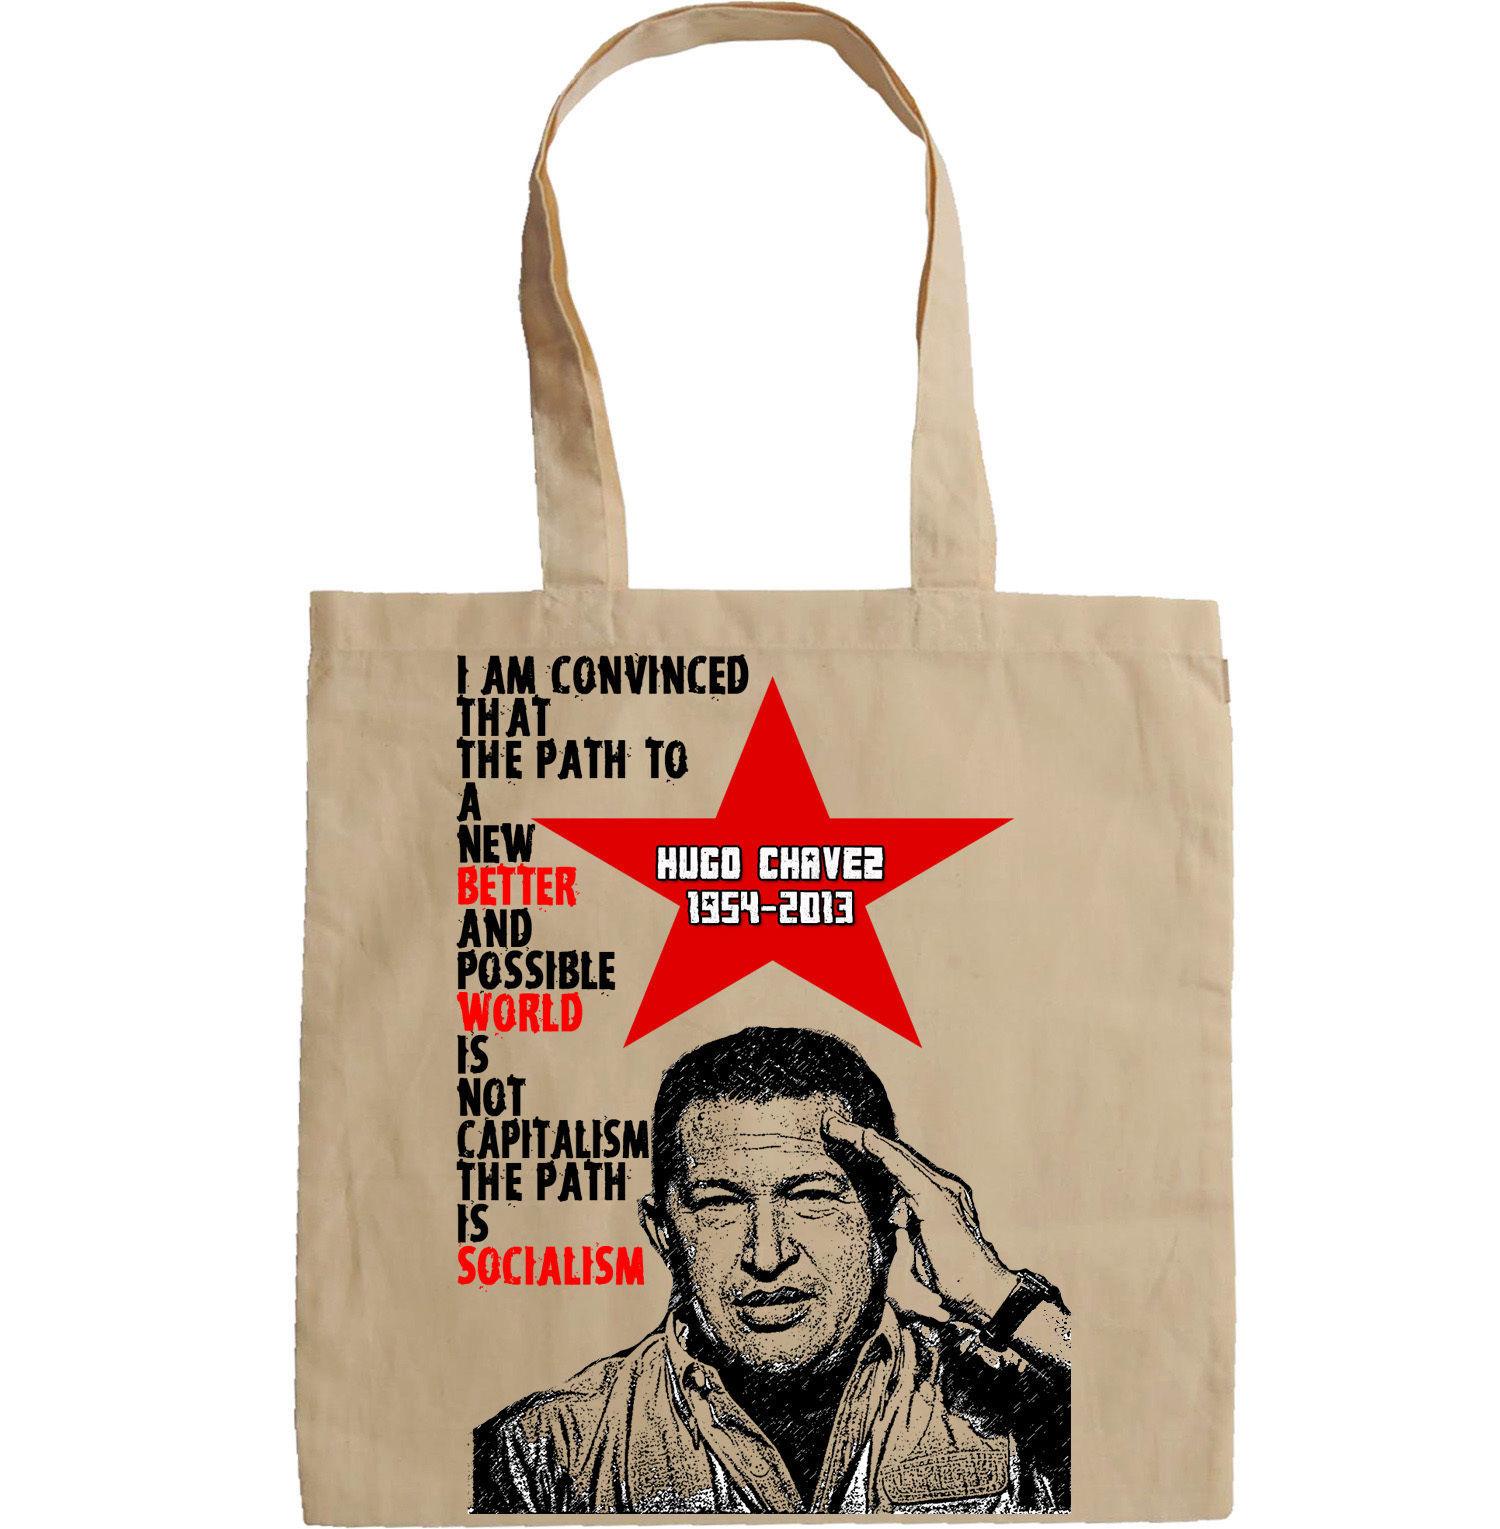 HUGO CHAVEZ VENEZUELA PRESIDENT - NEW AMAZING GRAPHIC HAND BAG/TOTE BAG